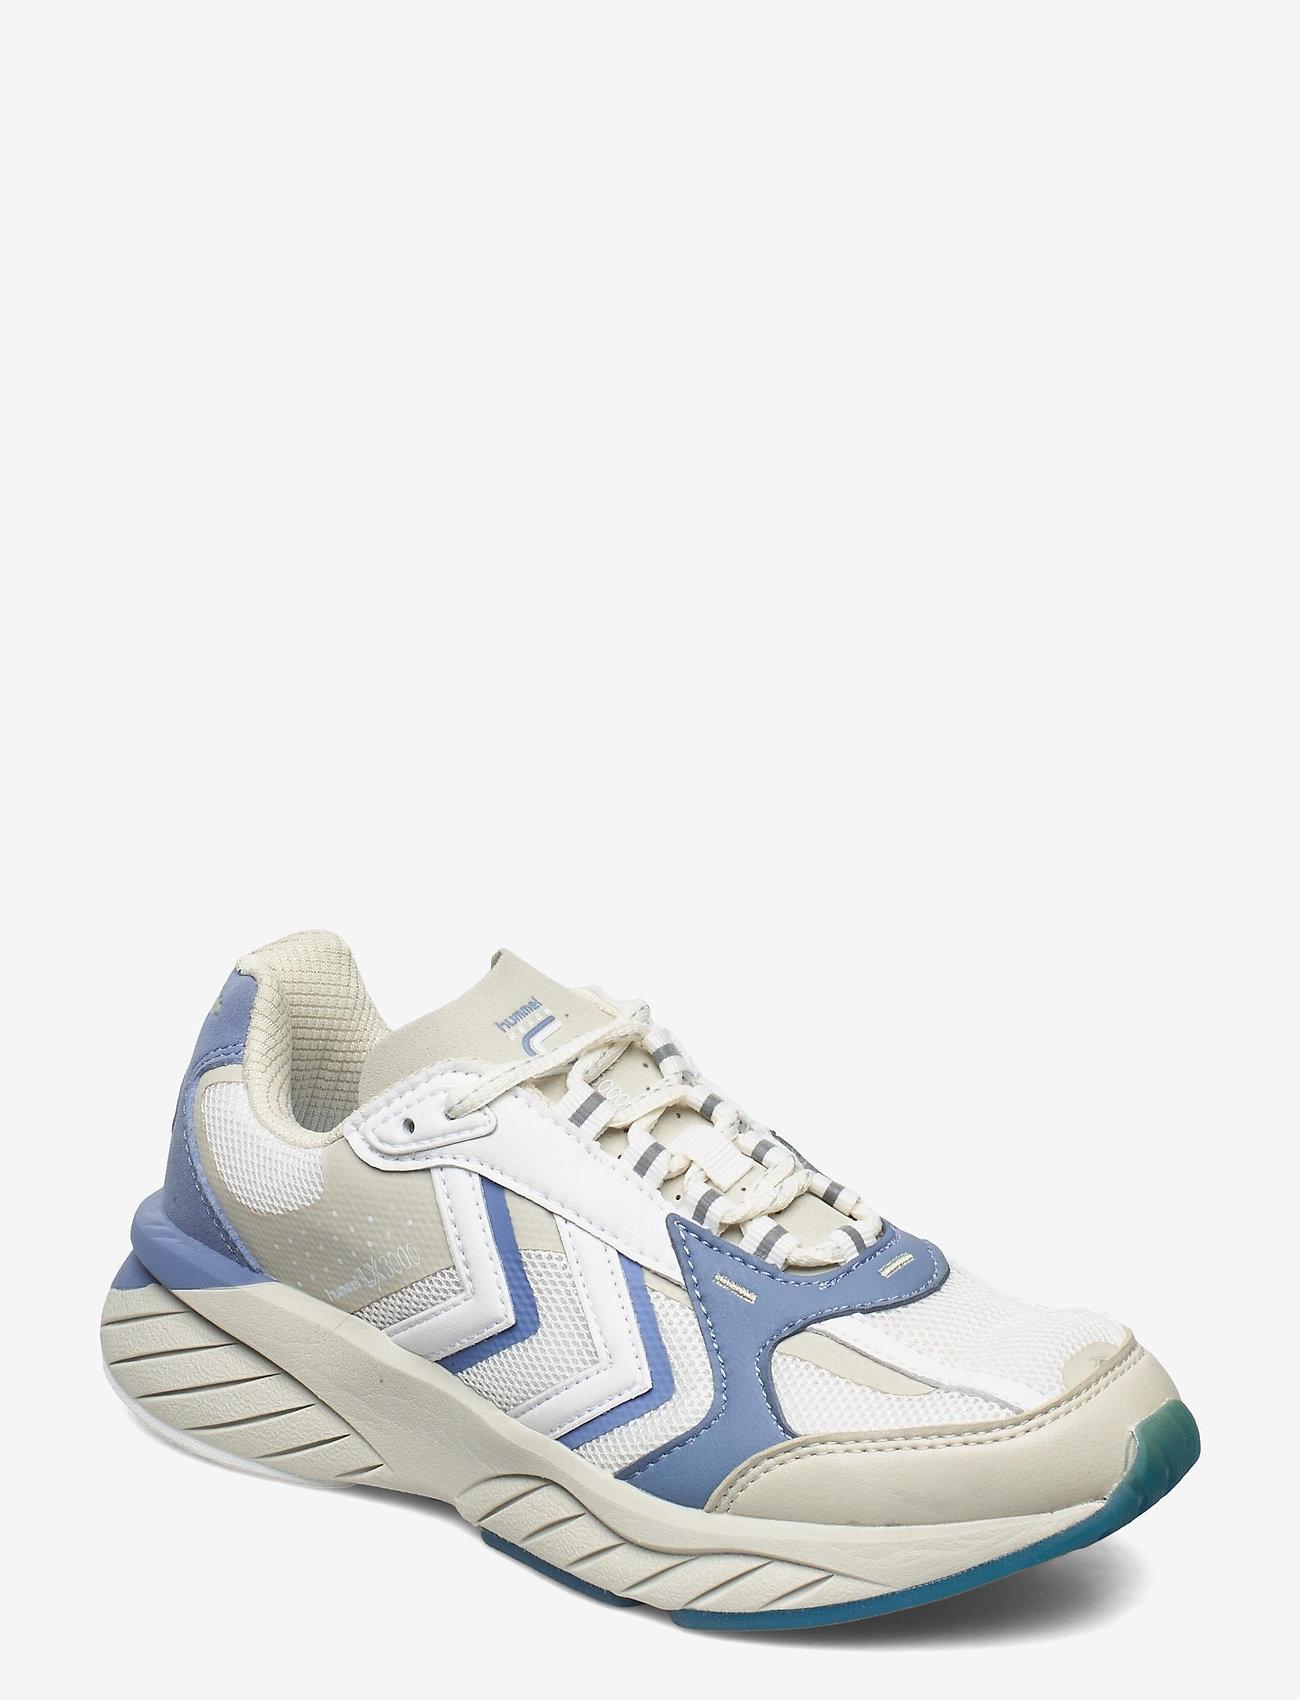 Hummel - REACH LX 3000 - laag sneakers - bone white - 1